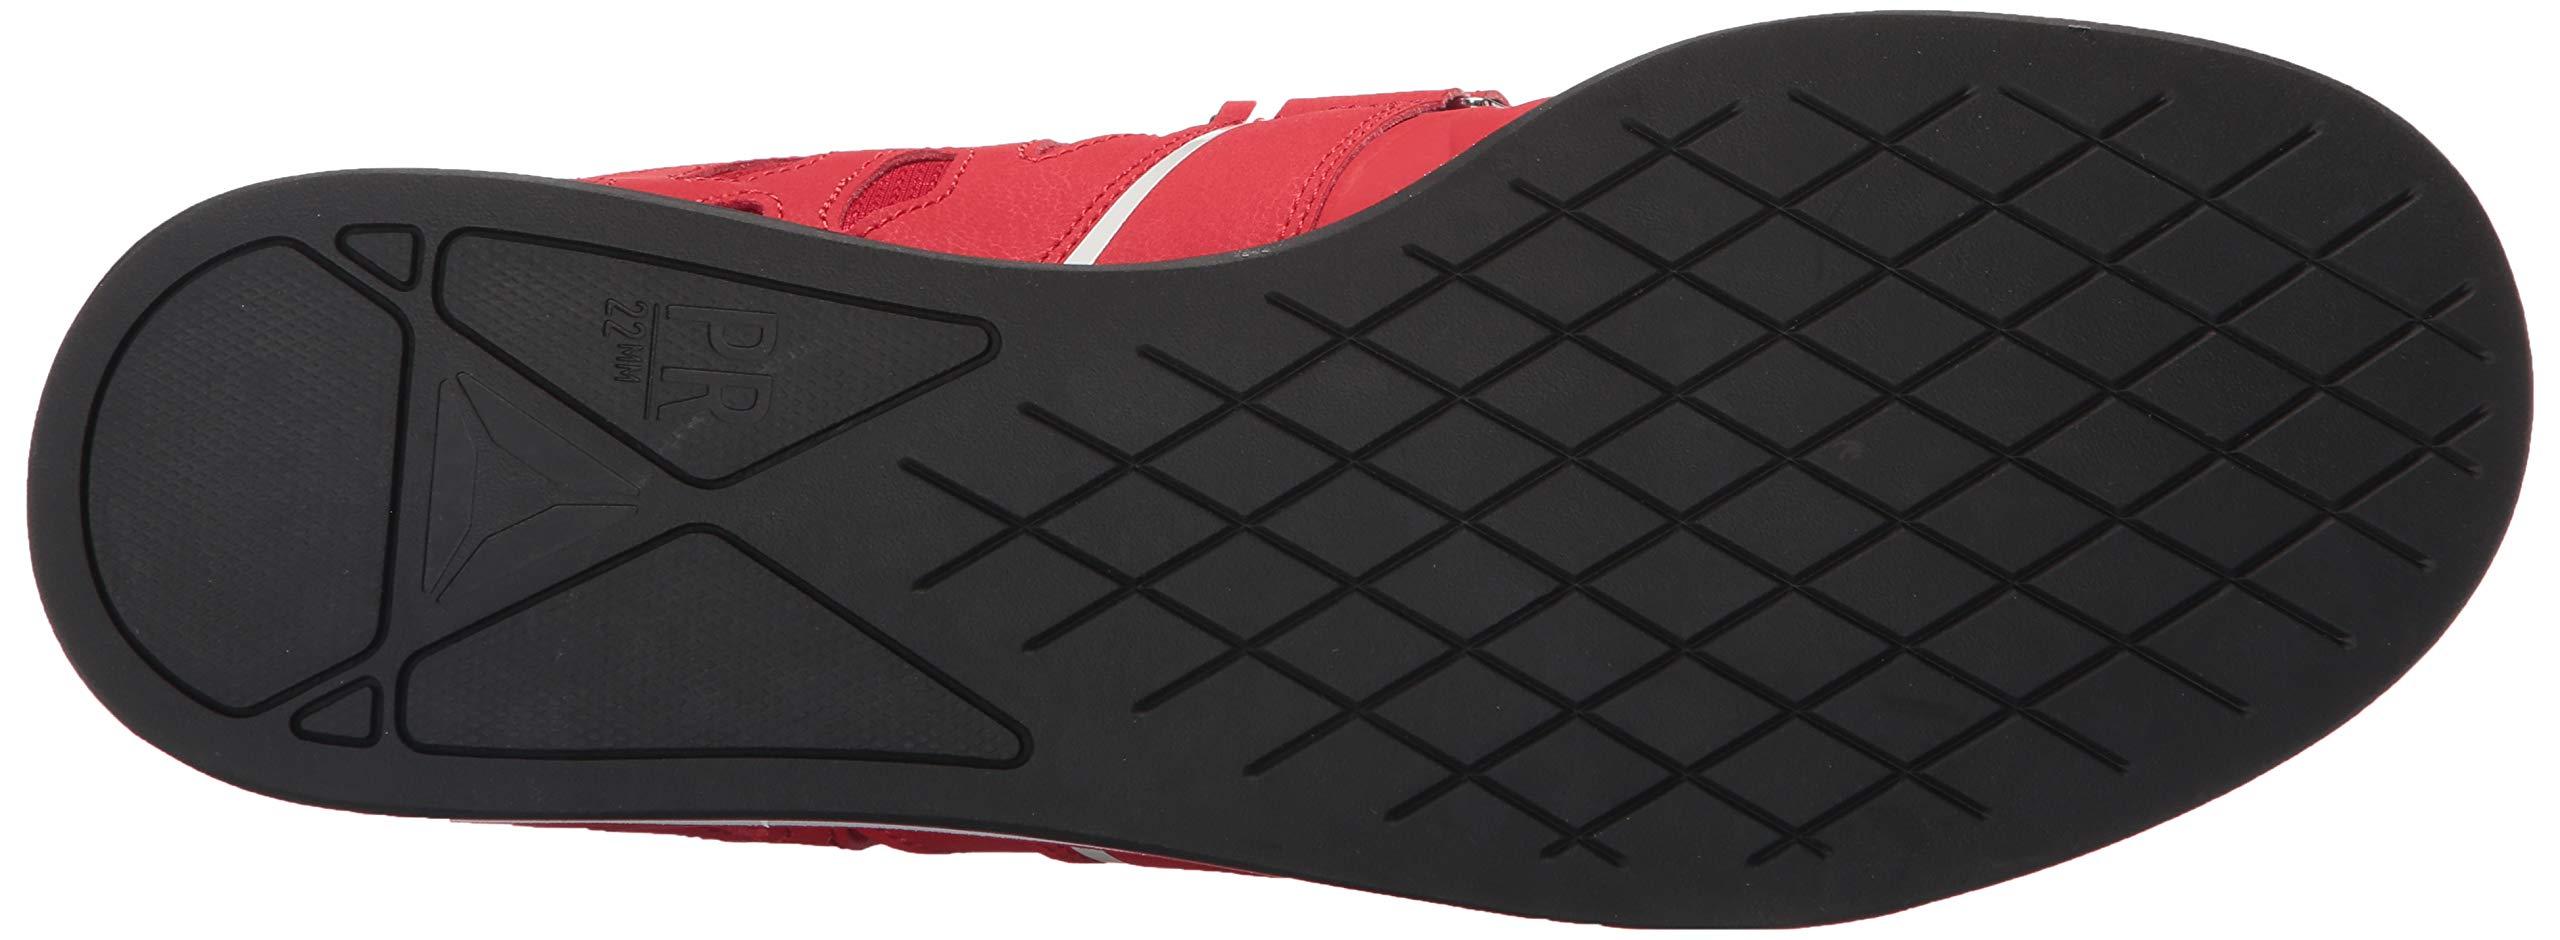 Reebok Men's Lifter Pr Cross-Trainer Shoe, Primal Red/Black/White, 7.5 M US by Reebok (Image #3)